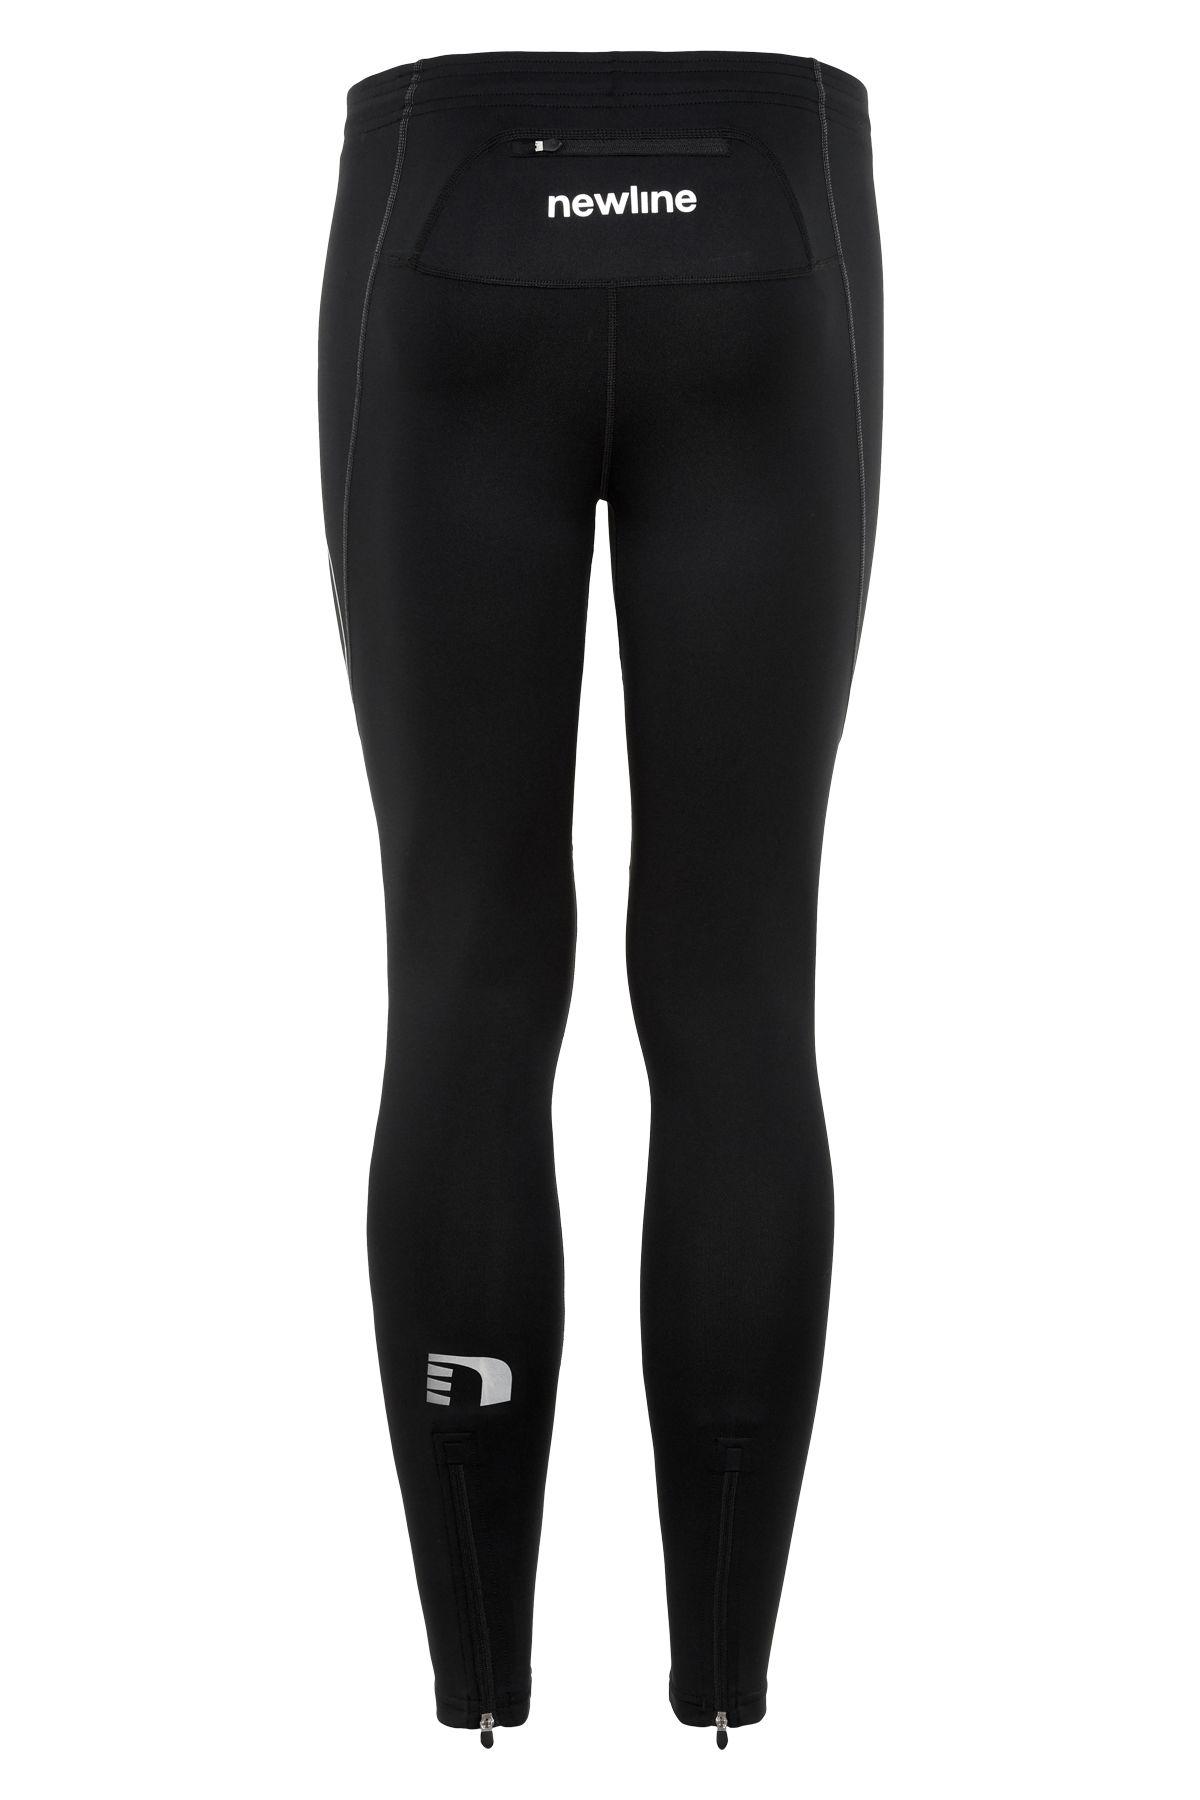 Newline Core tights, black, medium